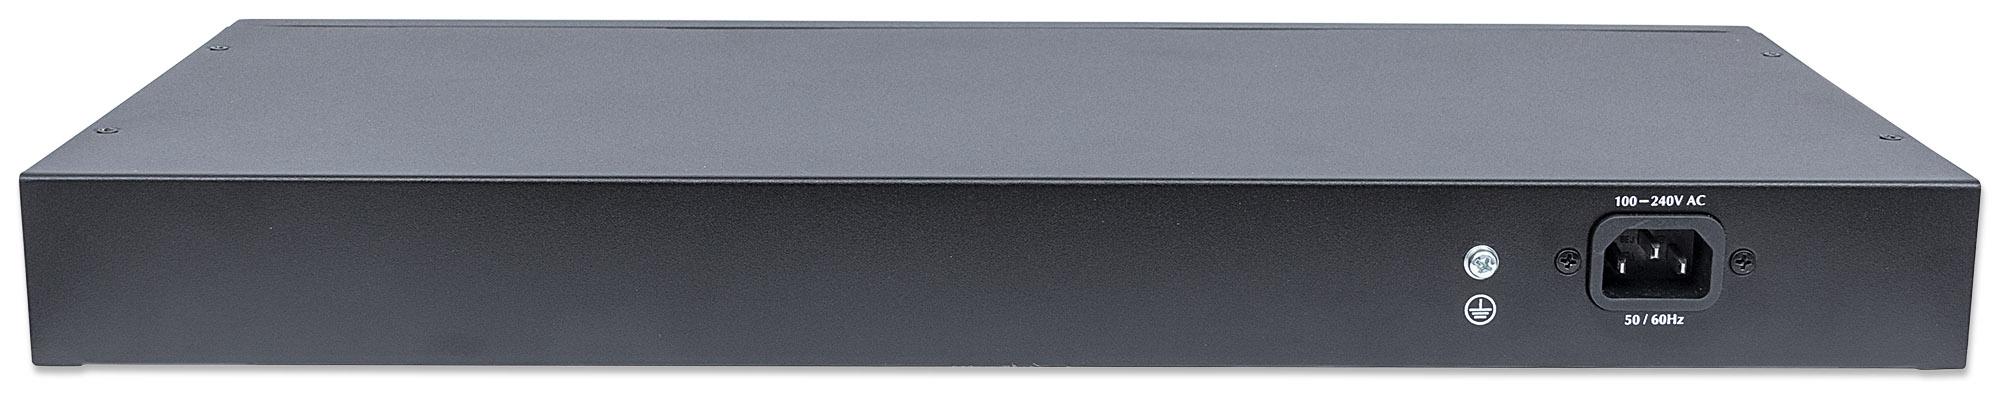 16-Port Gigabit Ethernet PoE+ Web-Managed Switch with 2 SFP Ports